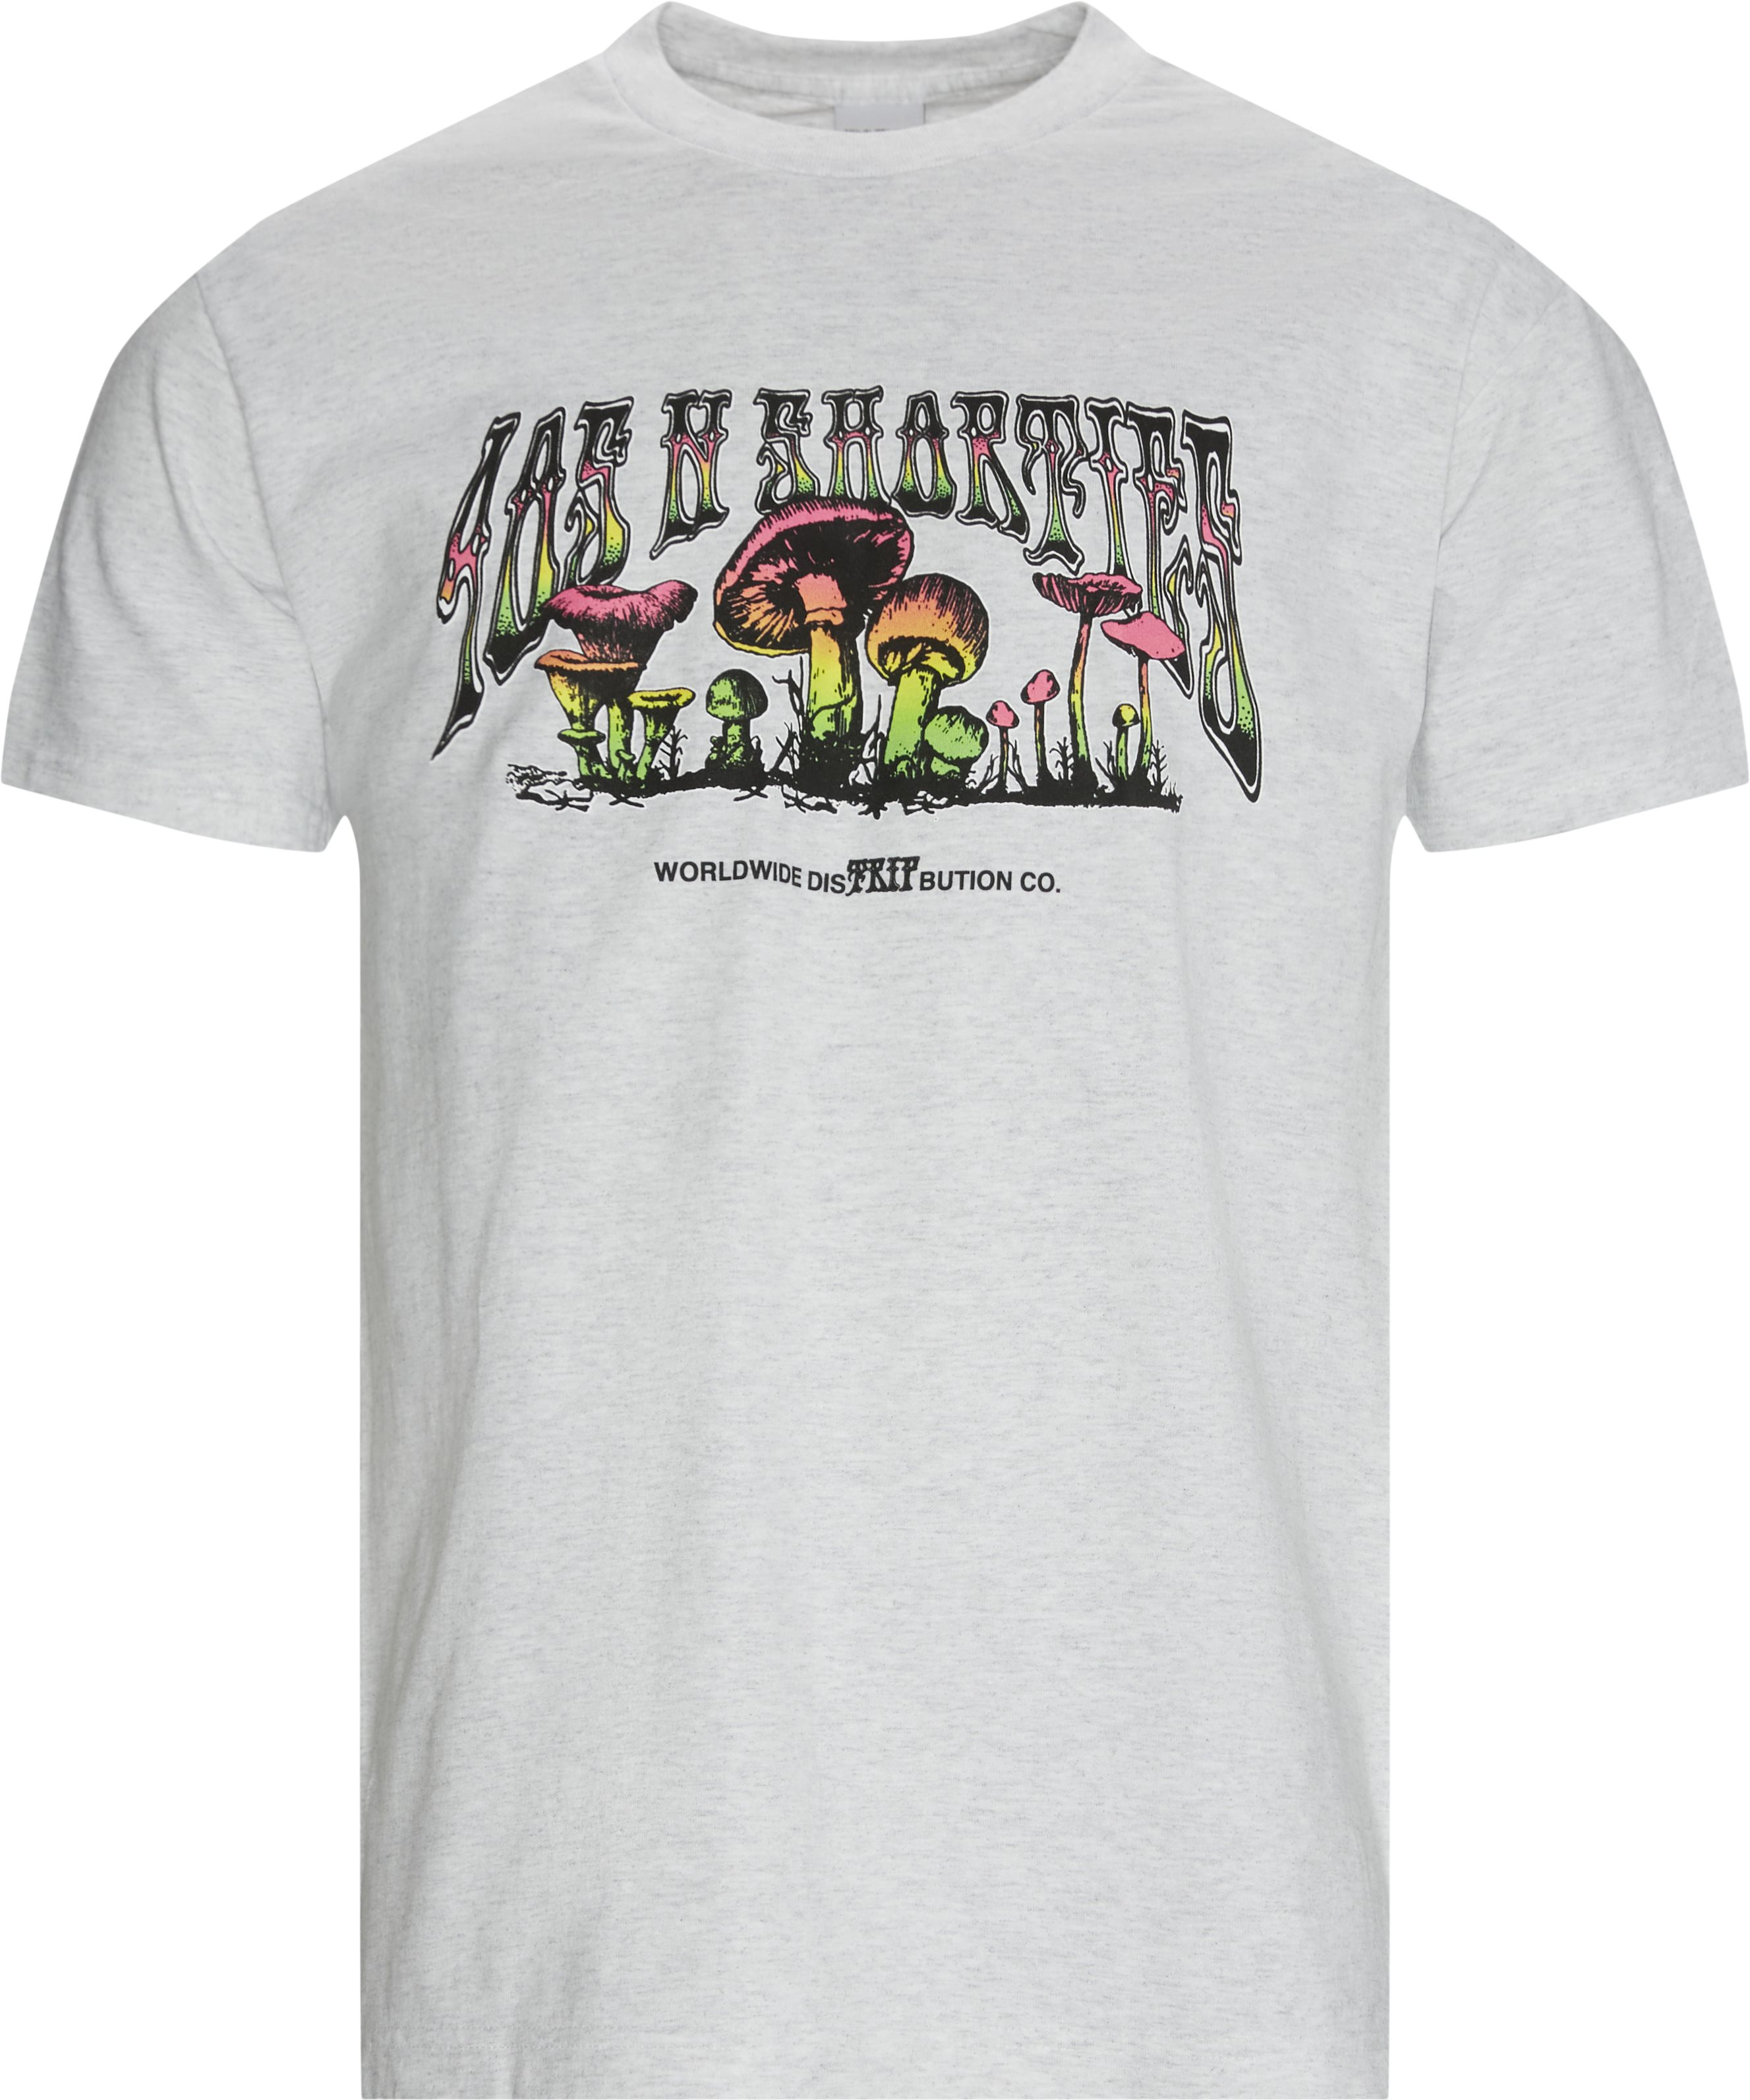 TRIP OUT T-shirt - T-shirts - Regular fit - Grå